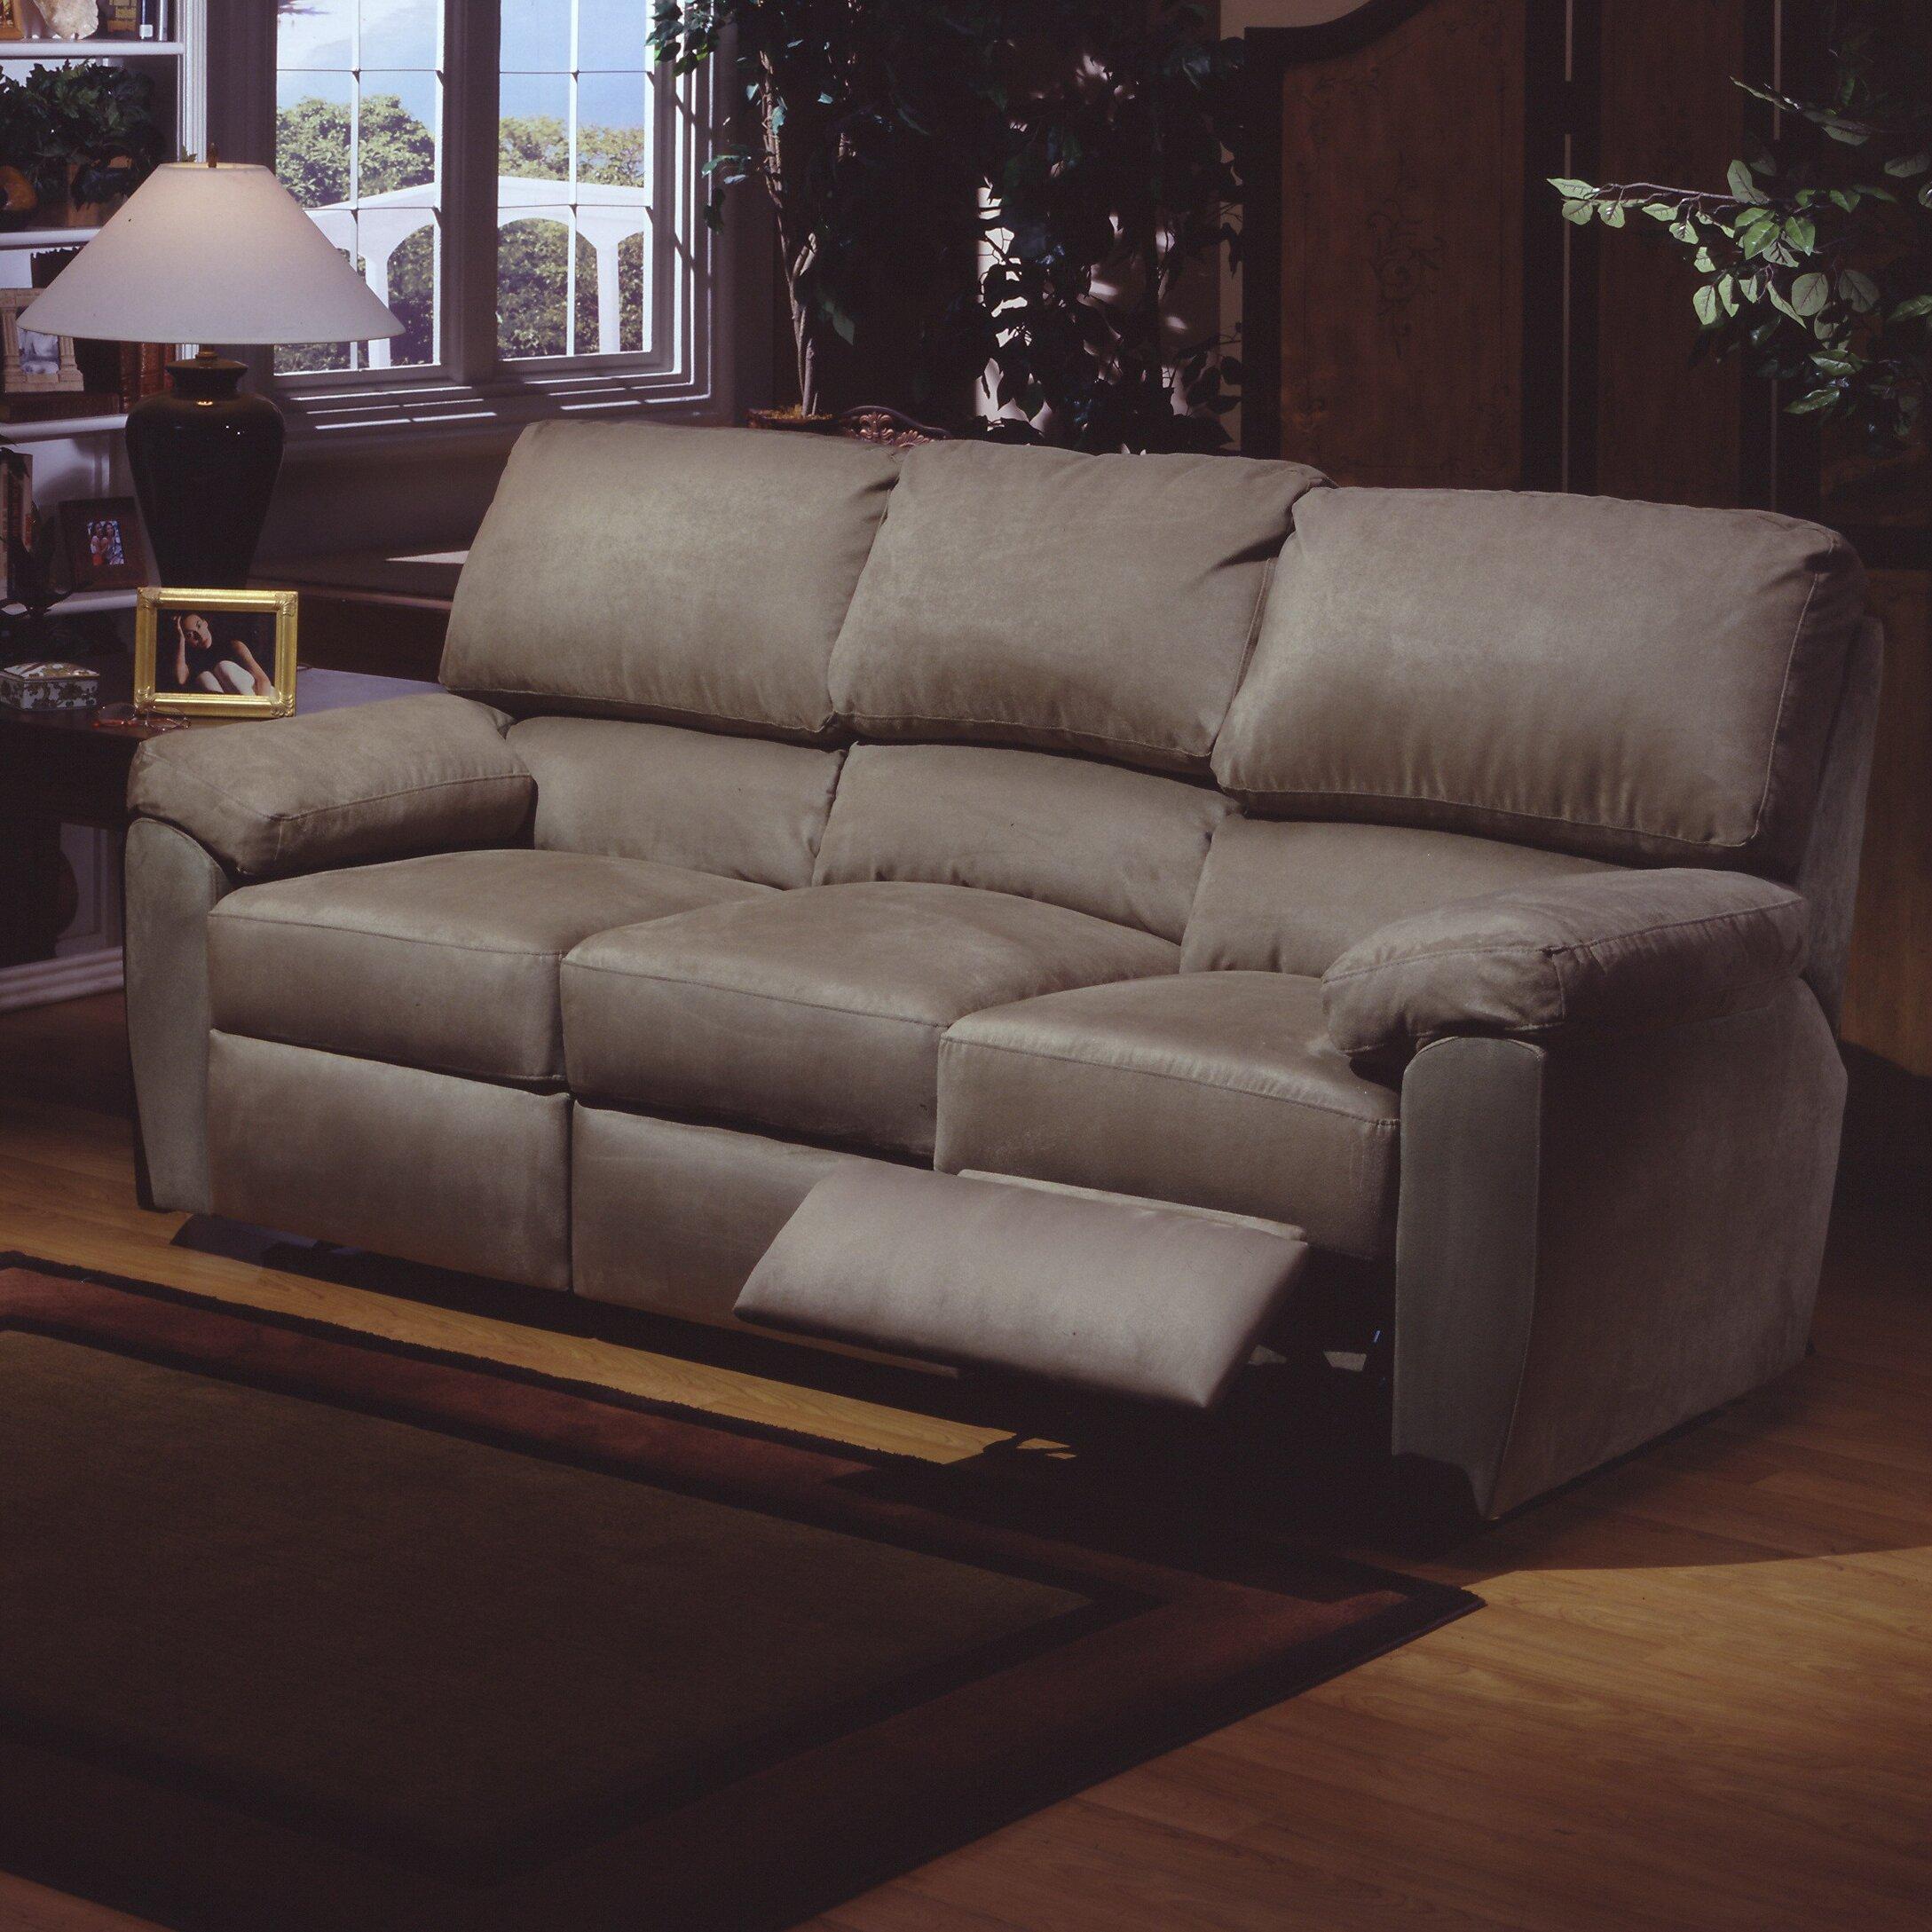 Omnia Leather Vercelli Leather Sofa Wayfair